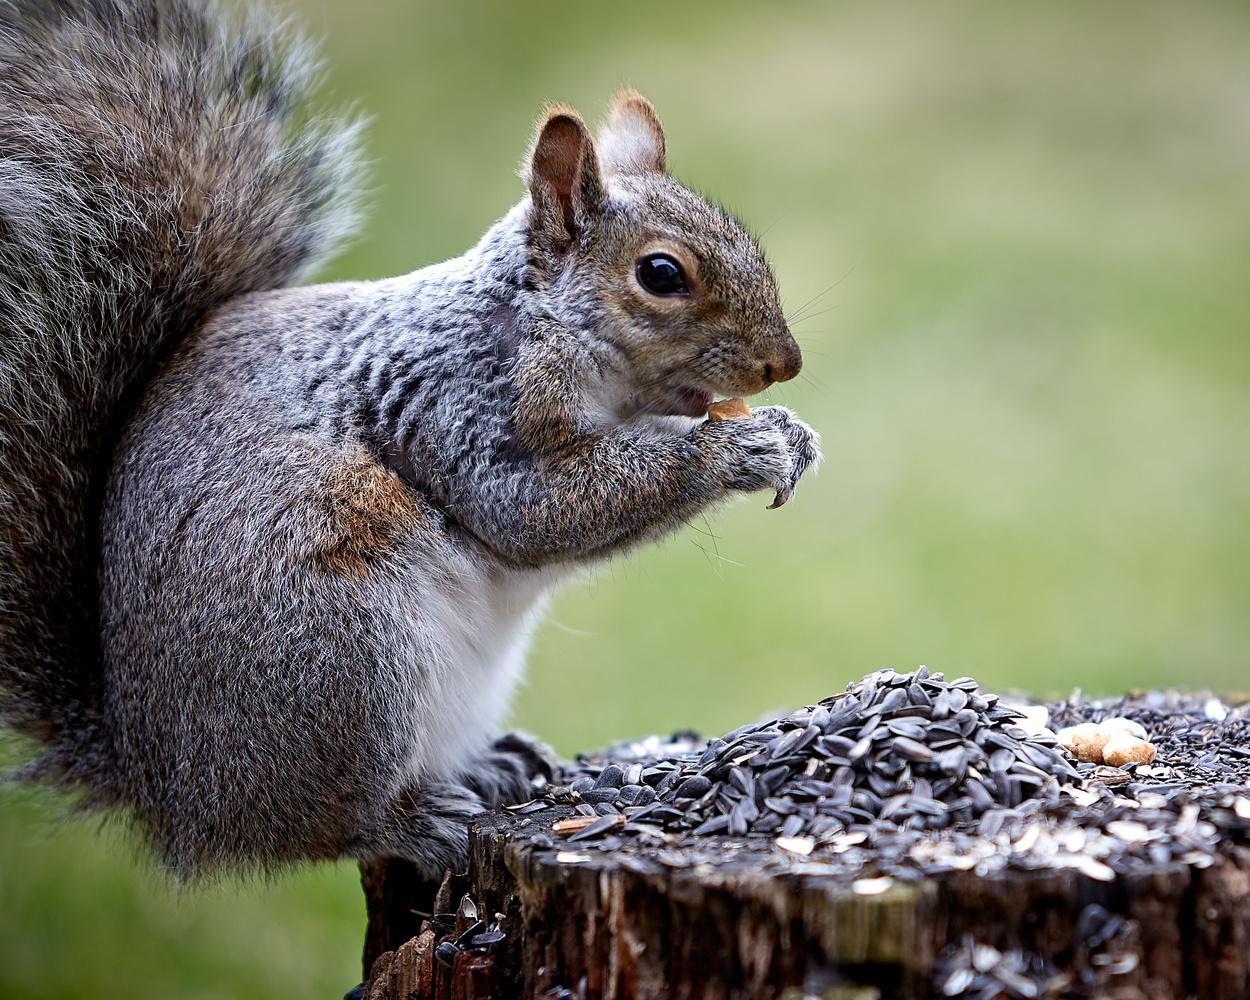 Squirrel by Hank Rintjema